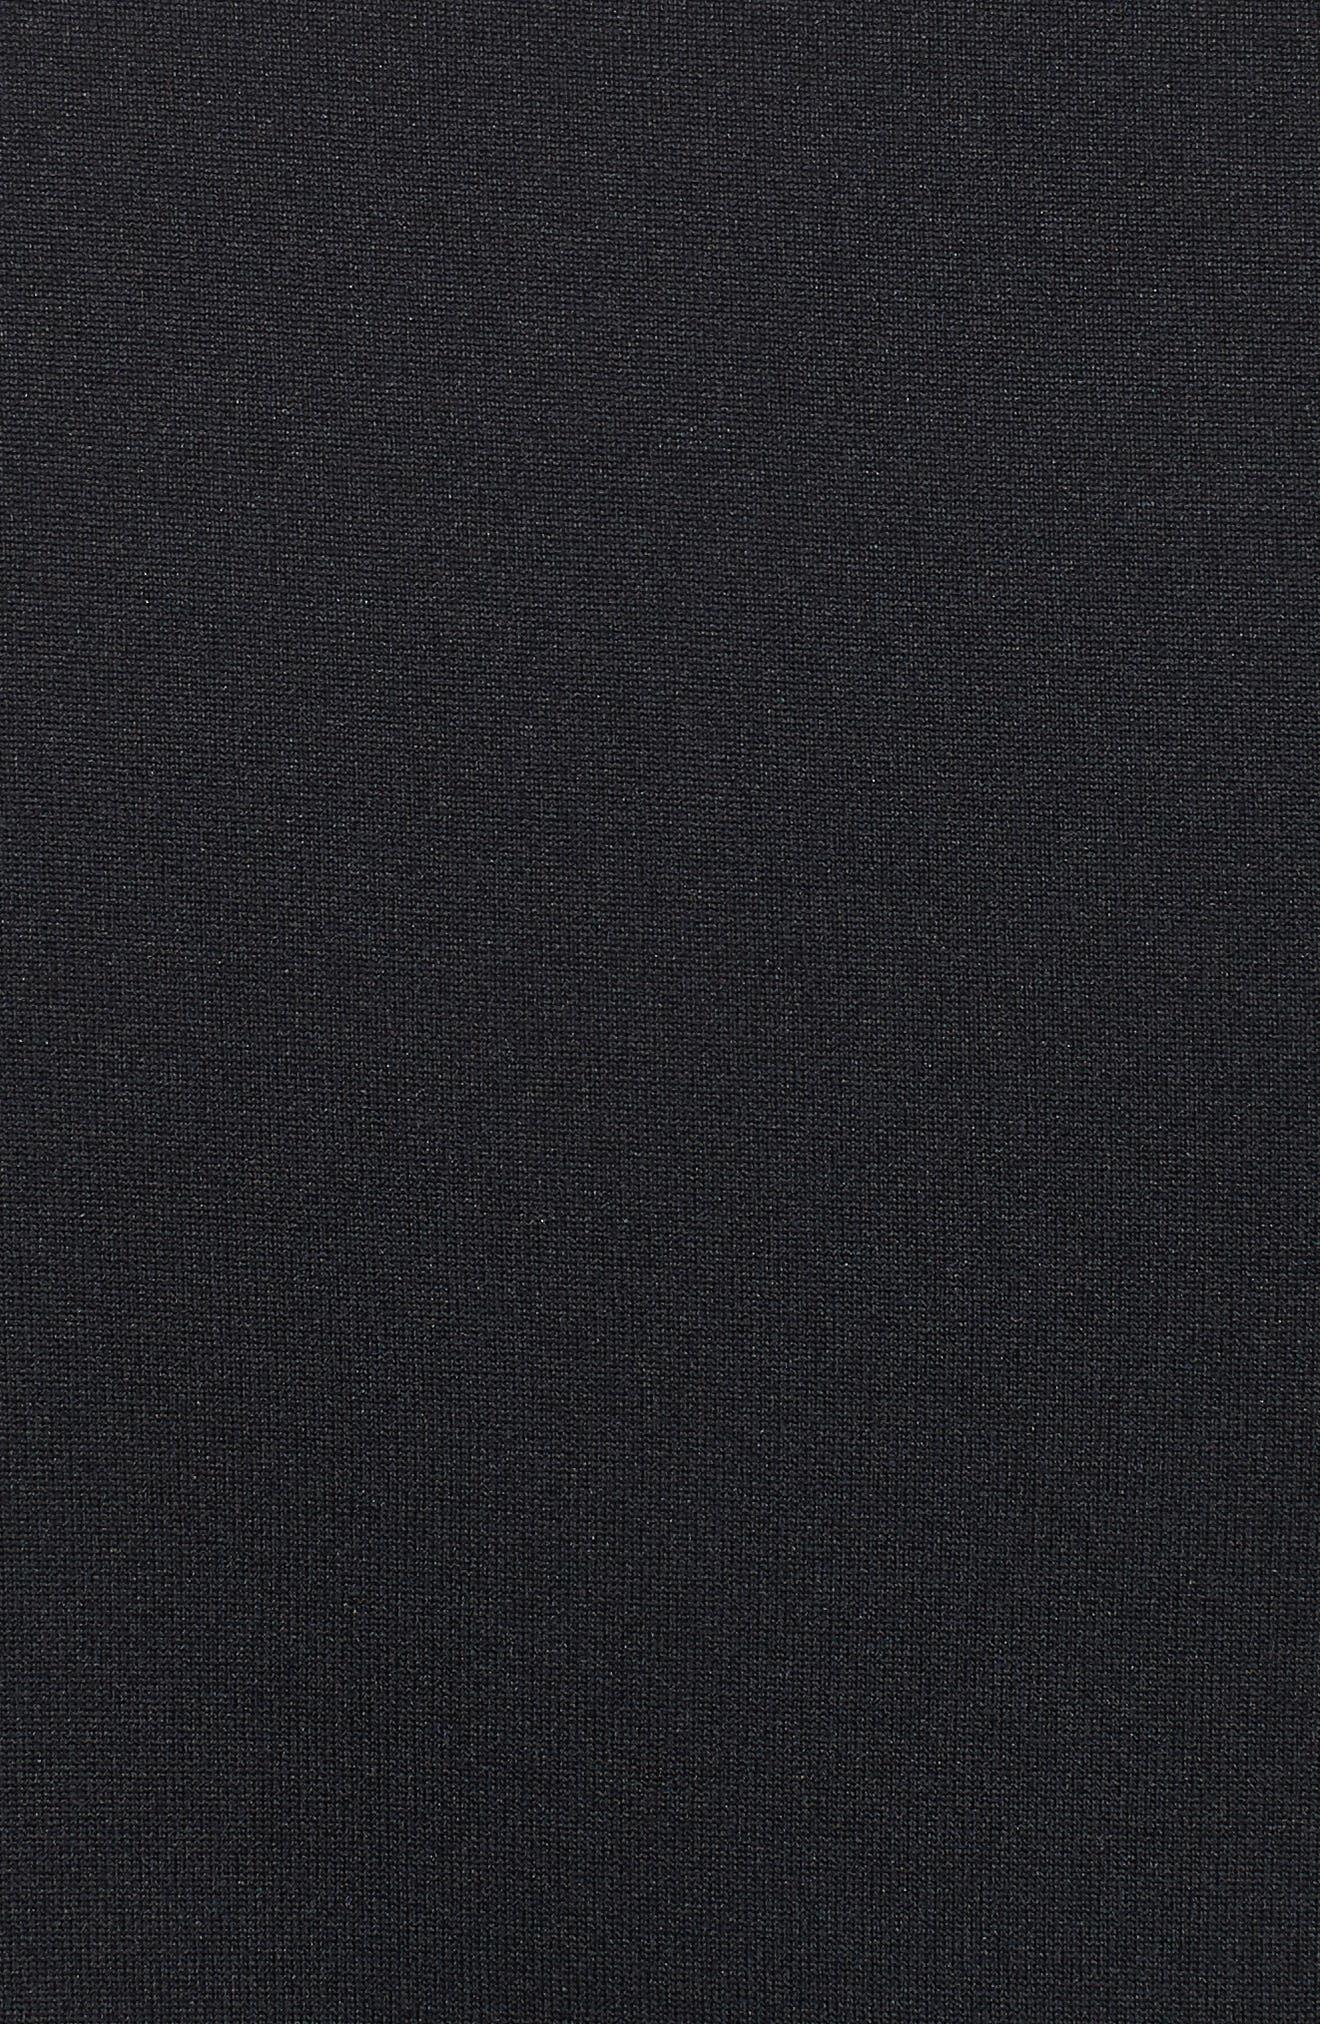 Performance Tech Long Sleeve Shirt,                             Alternate thumbnail 5, color,                             BLACK/ STEEL